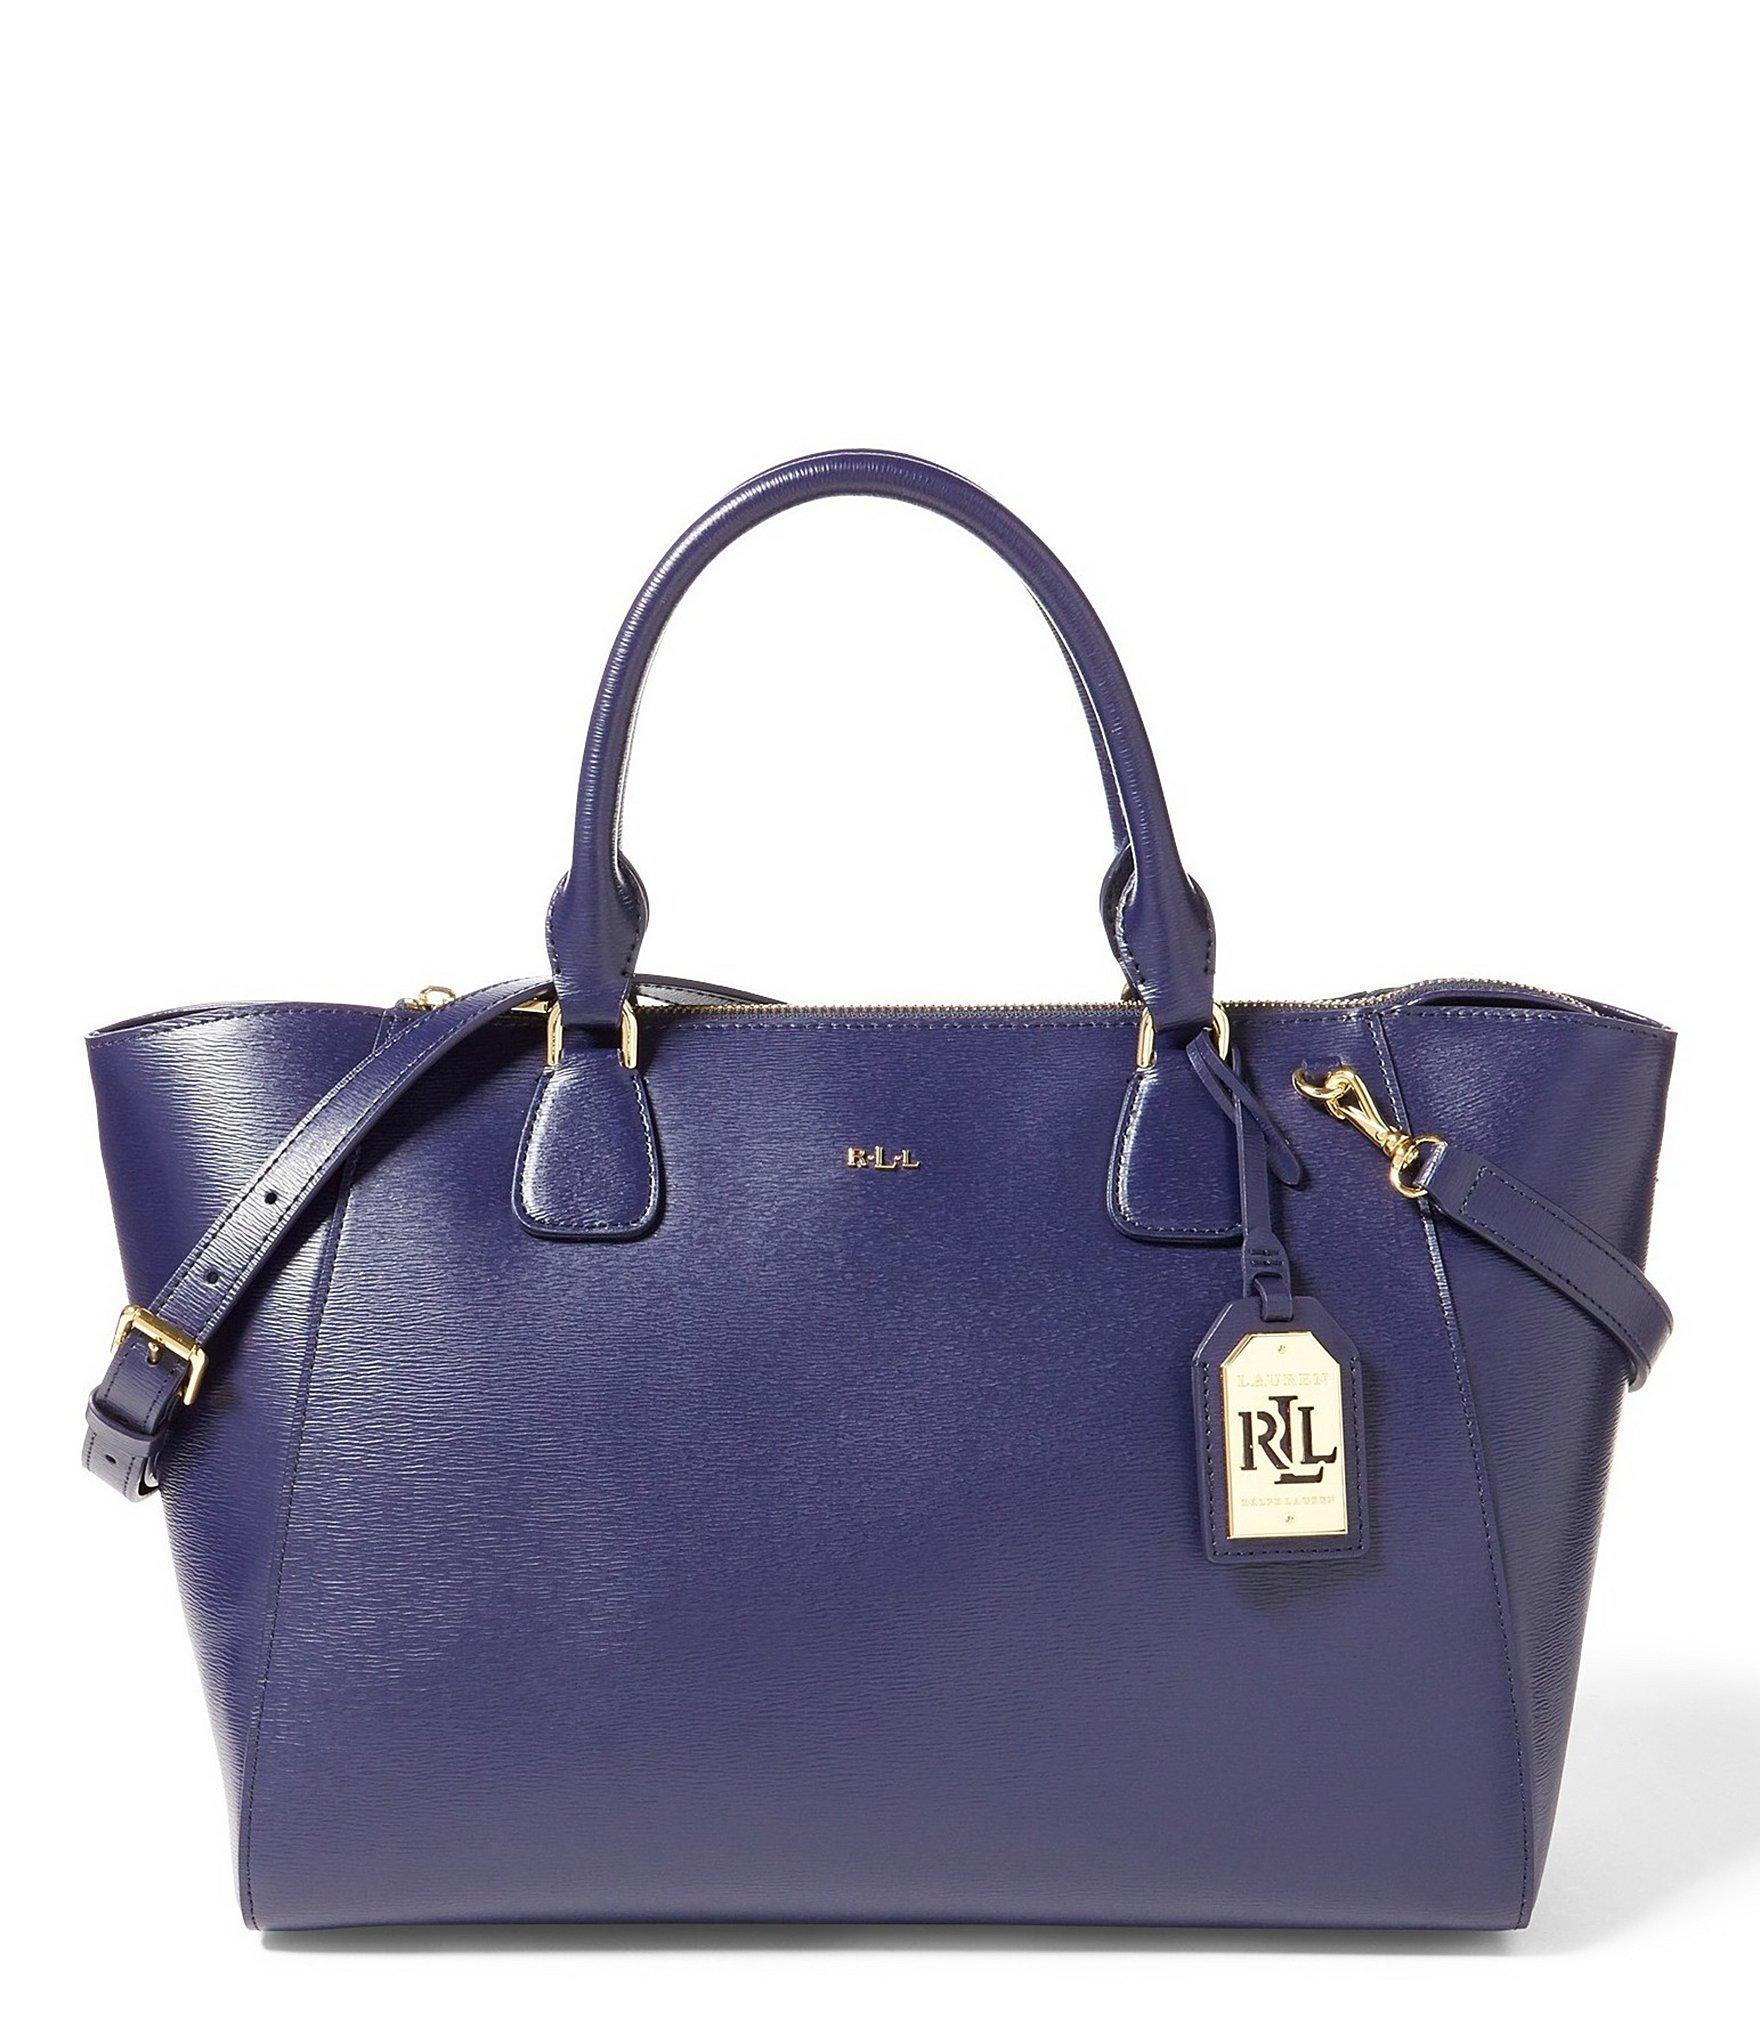 c4353b23c543 https   www.lyst.ca accessories retrosuperfuture-classic-flash ...